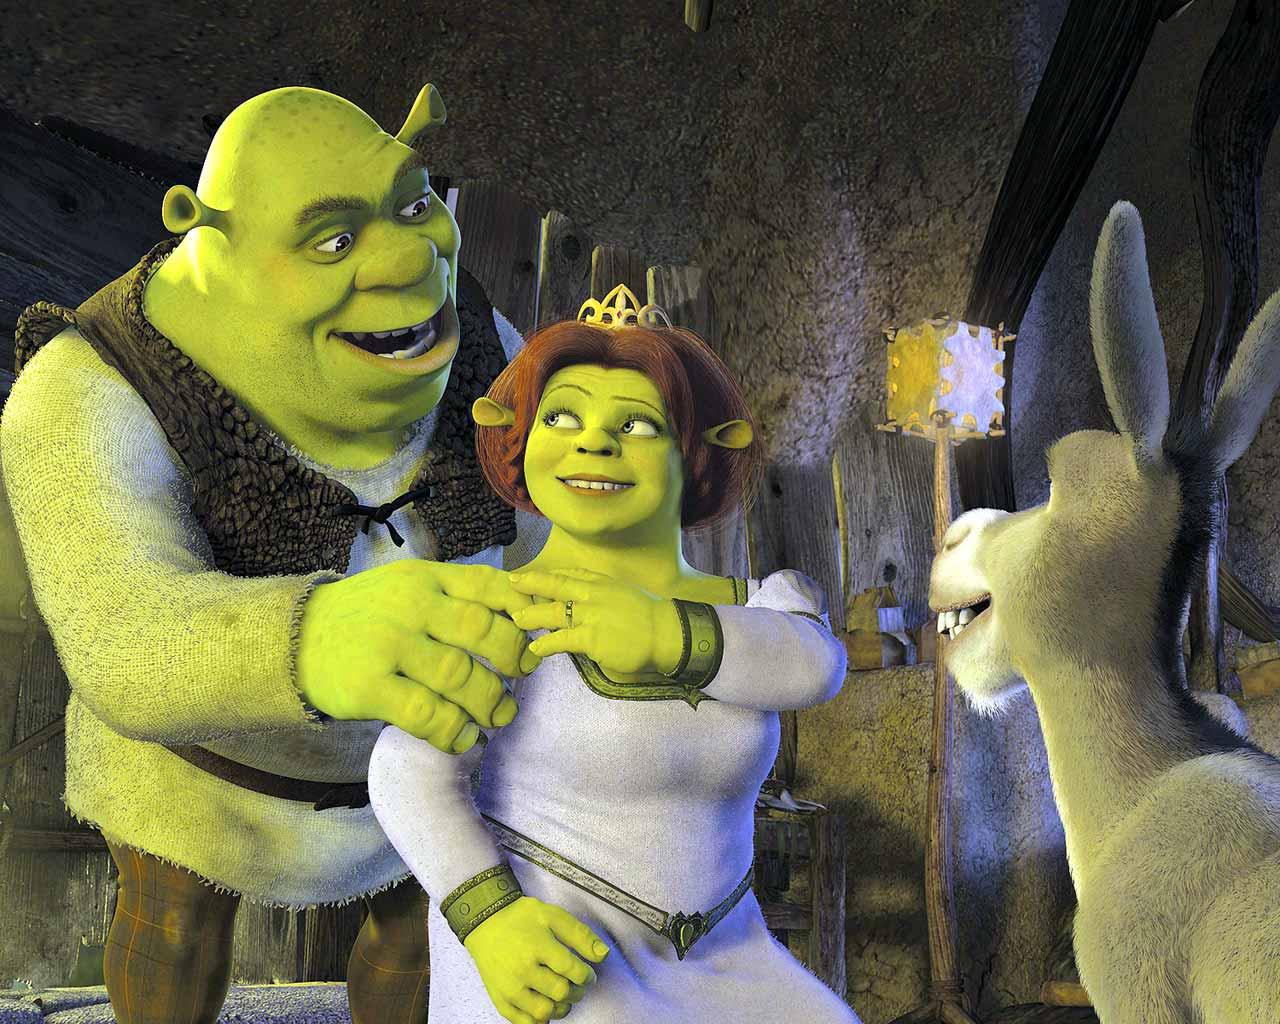 Shrek cartoon porn pics hentai pictures